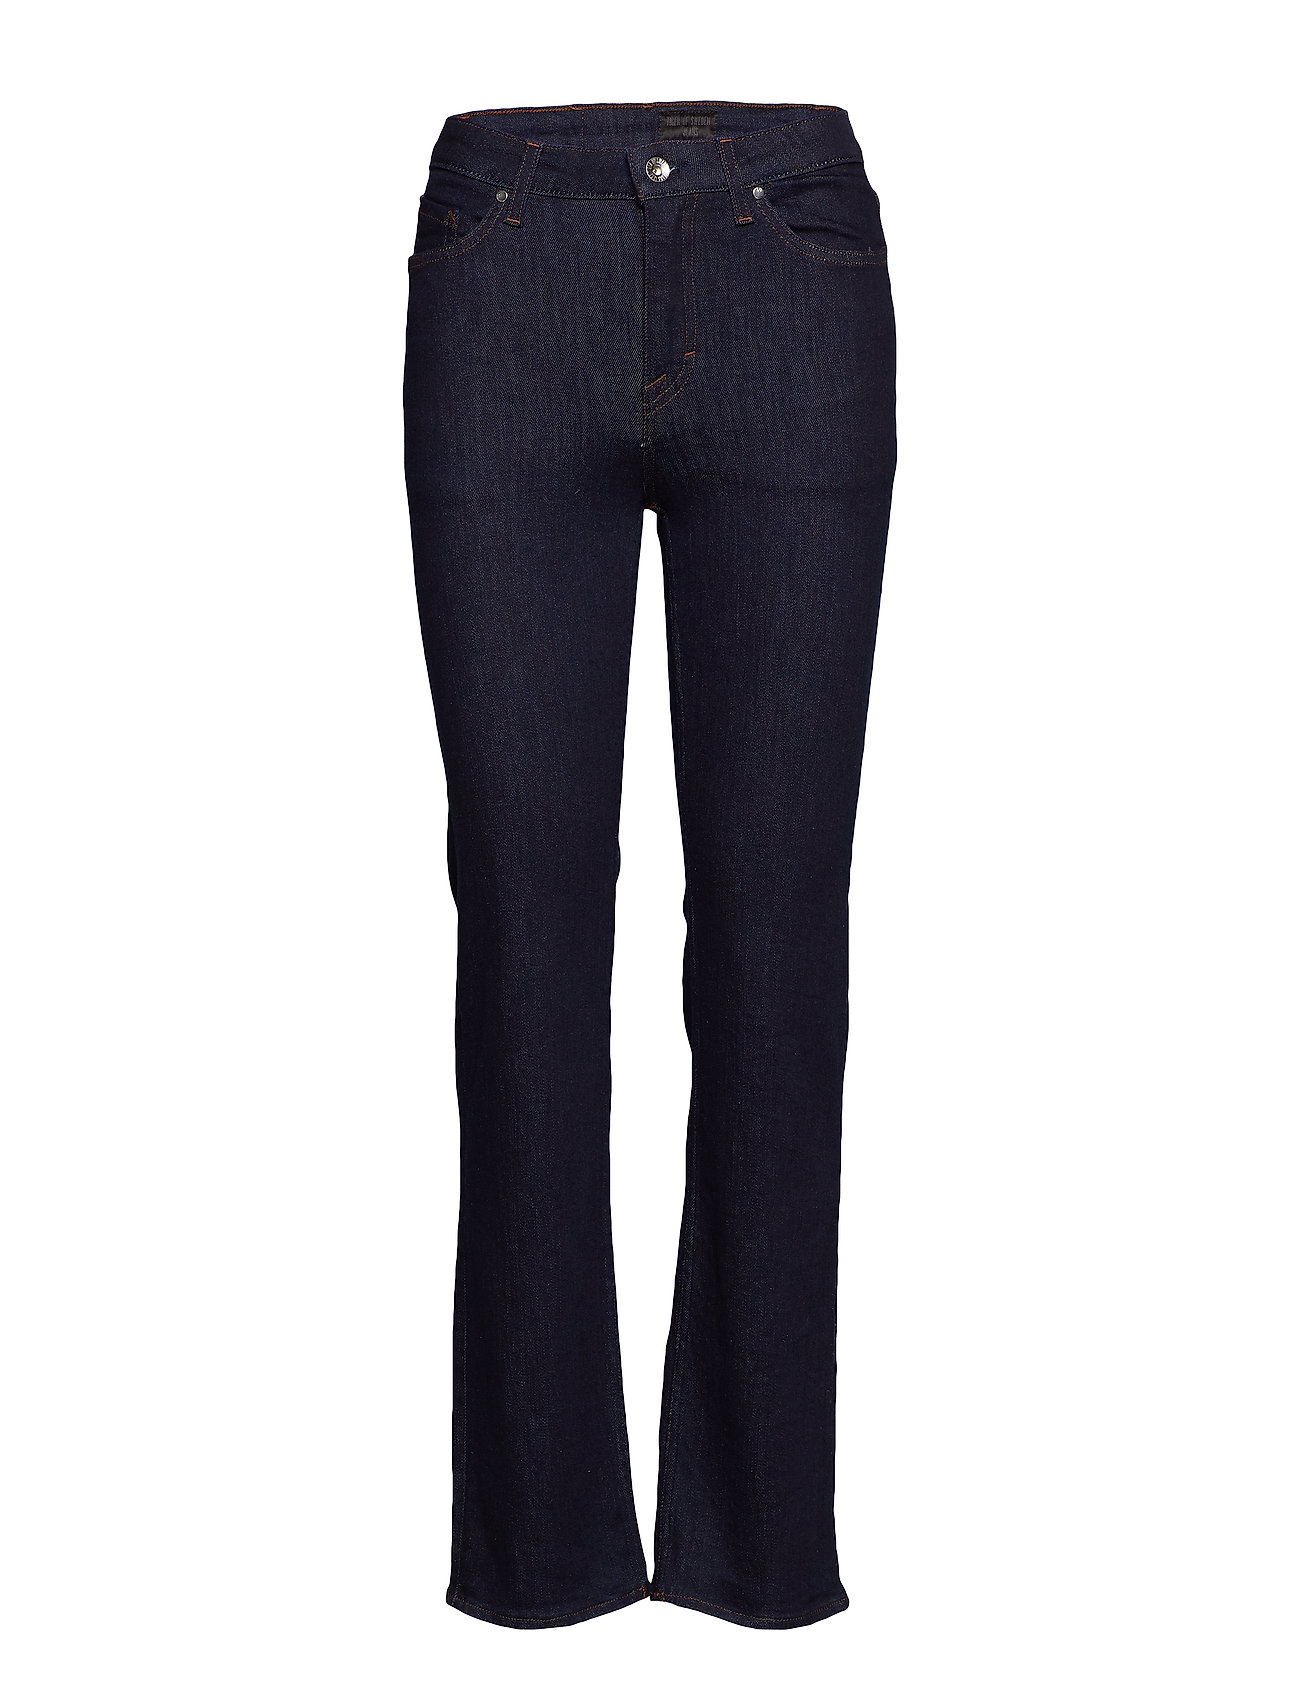 Jeans Amymidnight Sweden Of Amymidnight BlueTiger Of Jeans BlueTiger BlueTiger Amymidnight Sweden XPkTOiZu